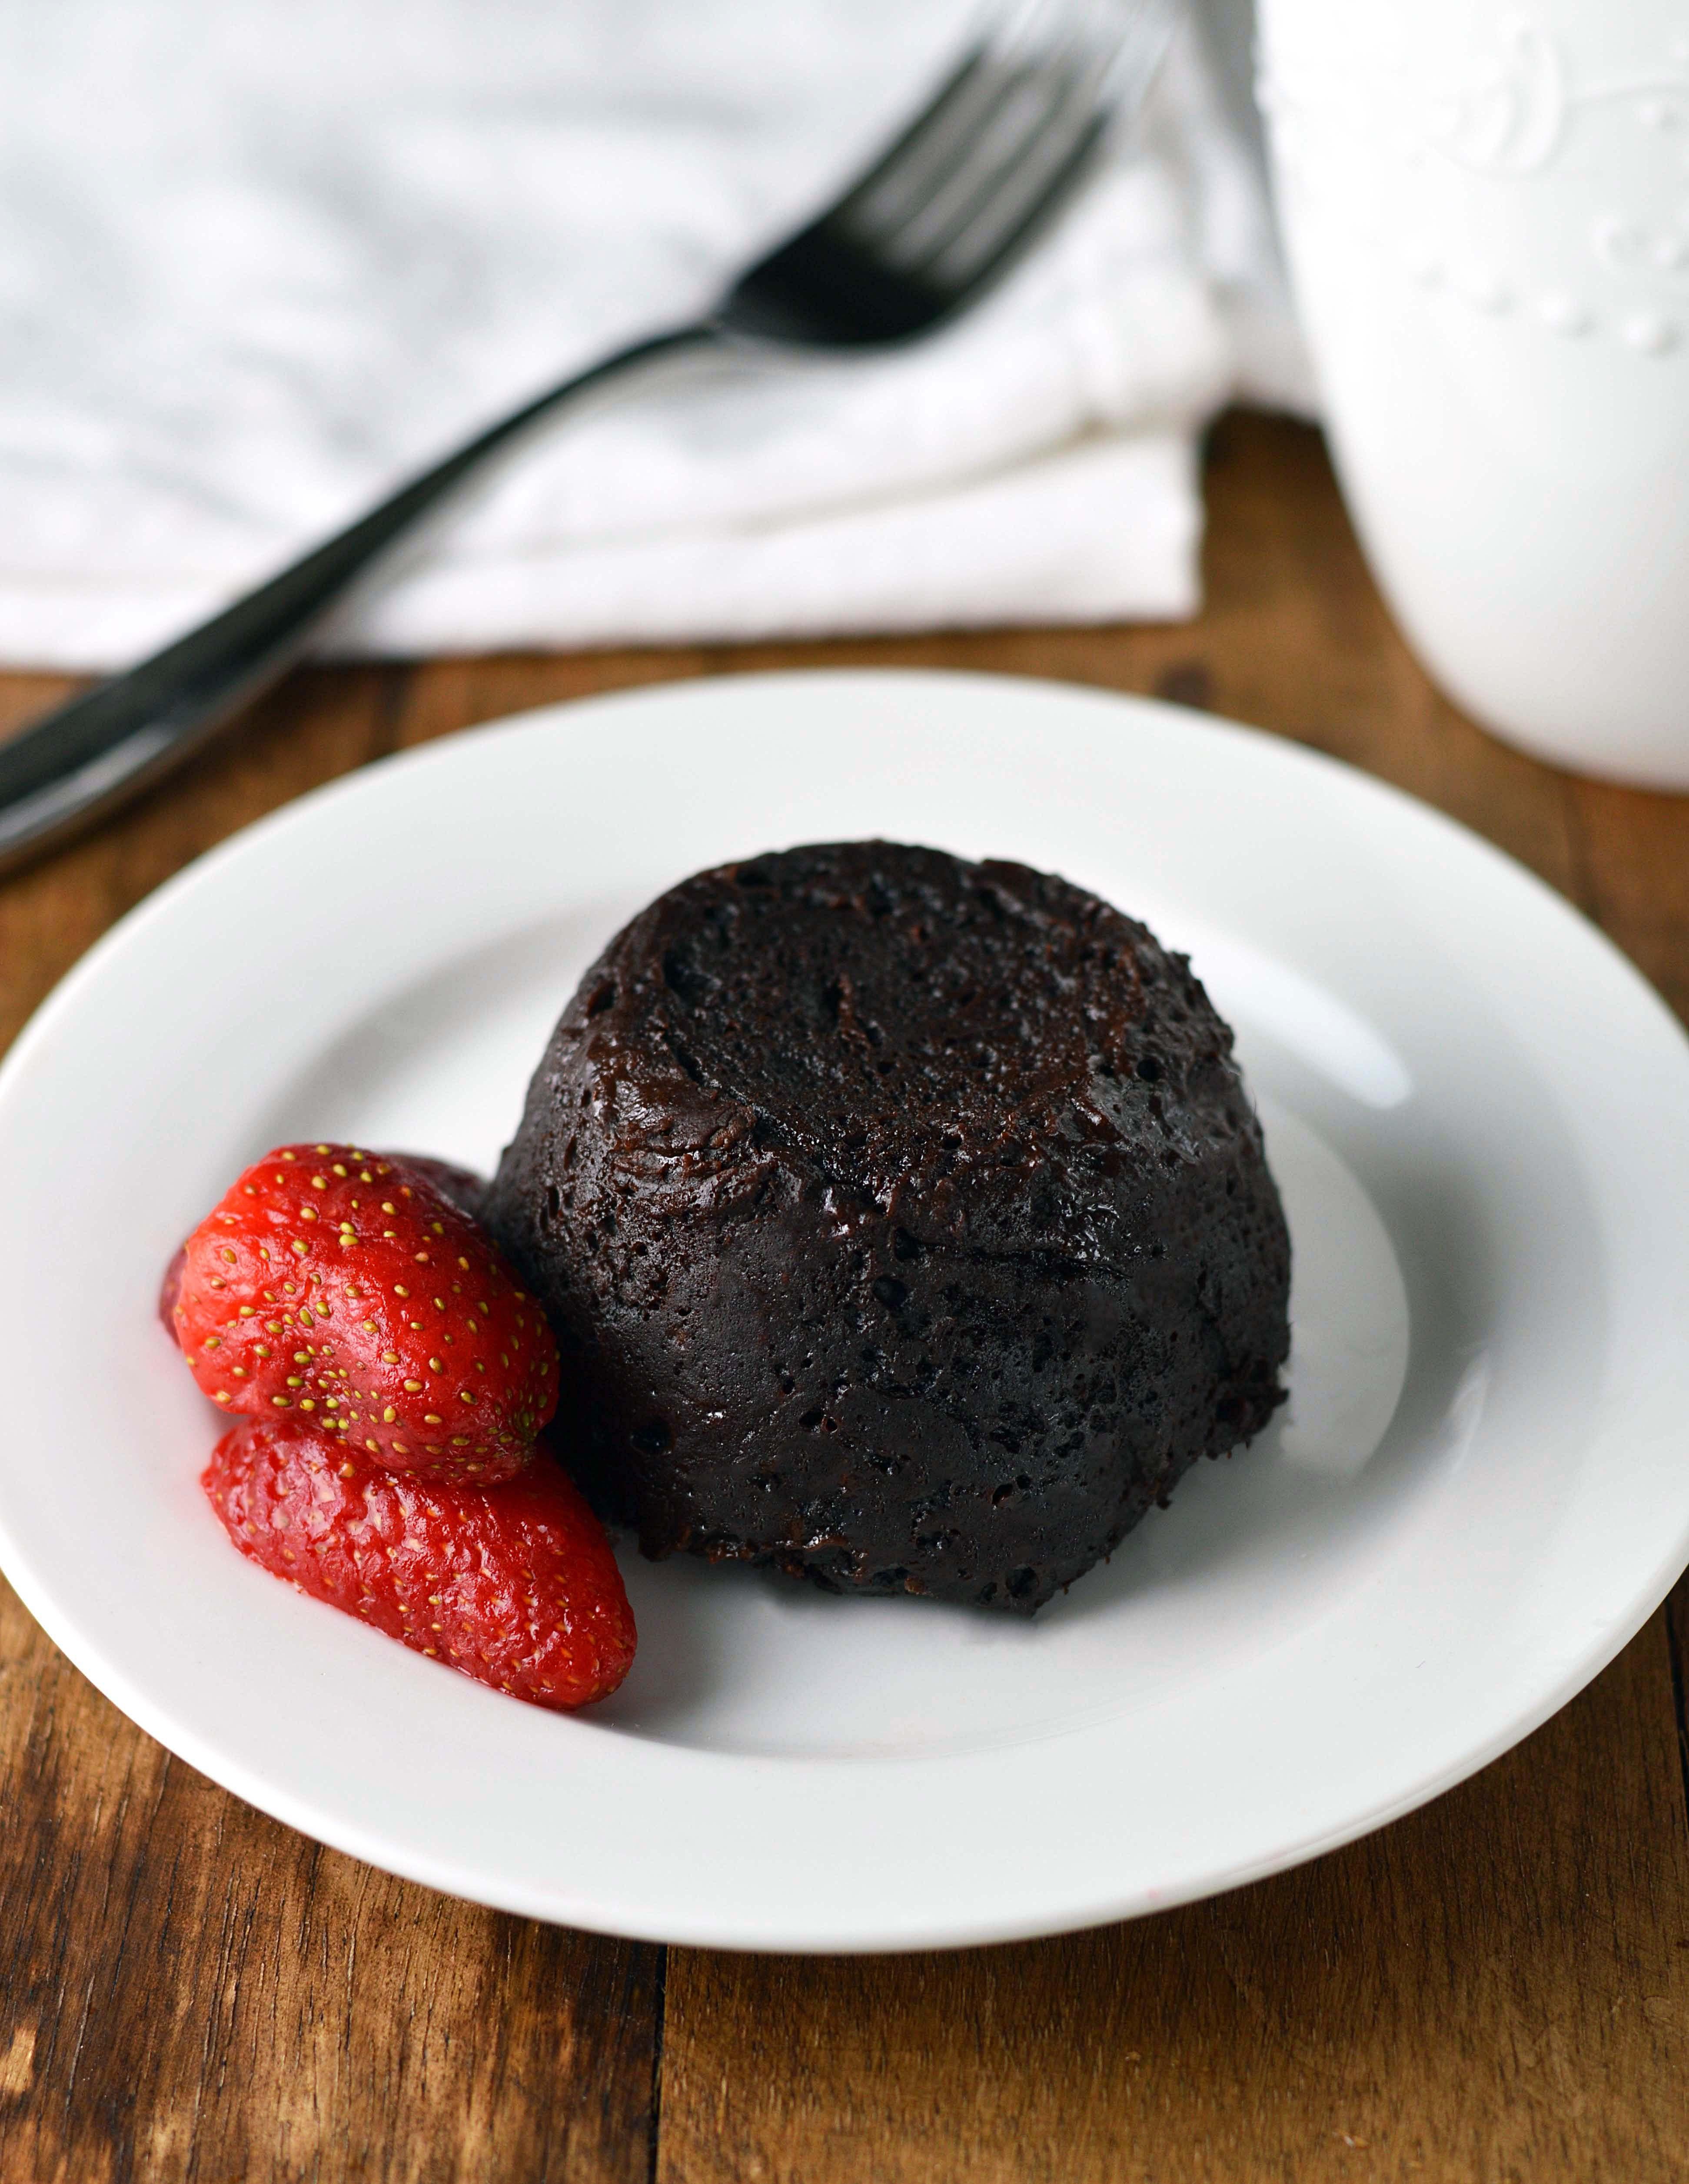 Gooey chocolate mug cake - Friday is Cake Night